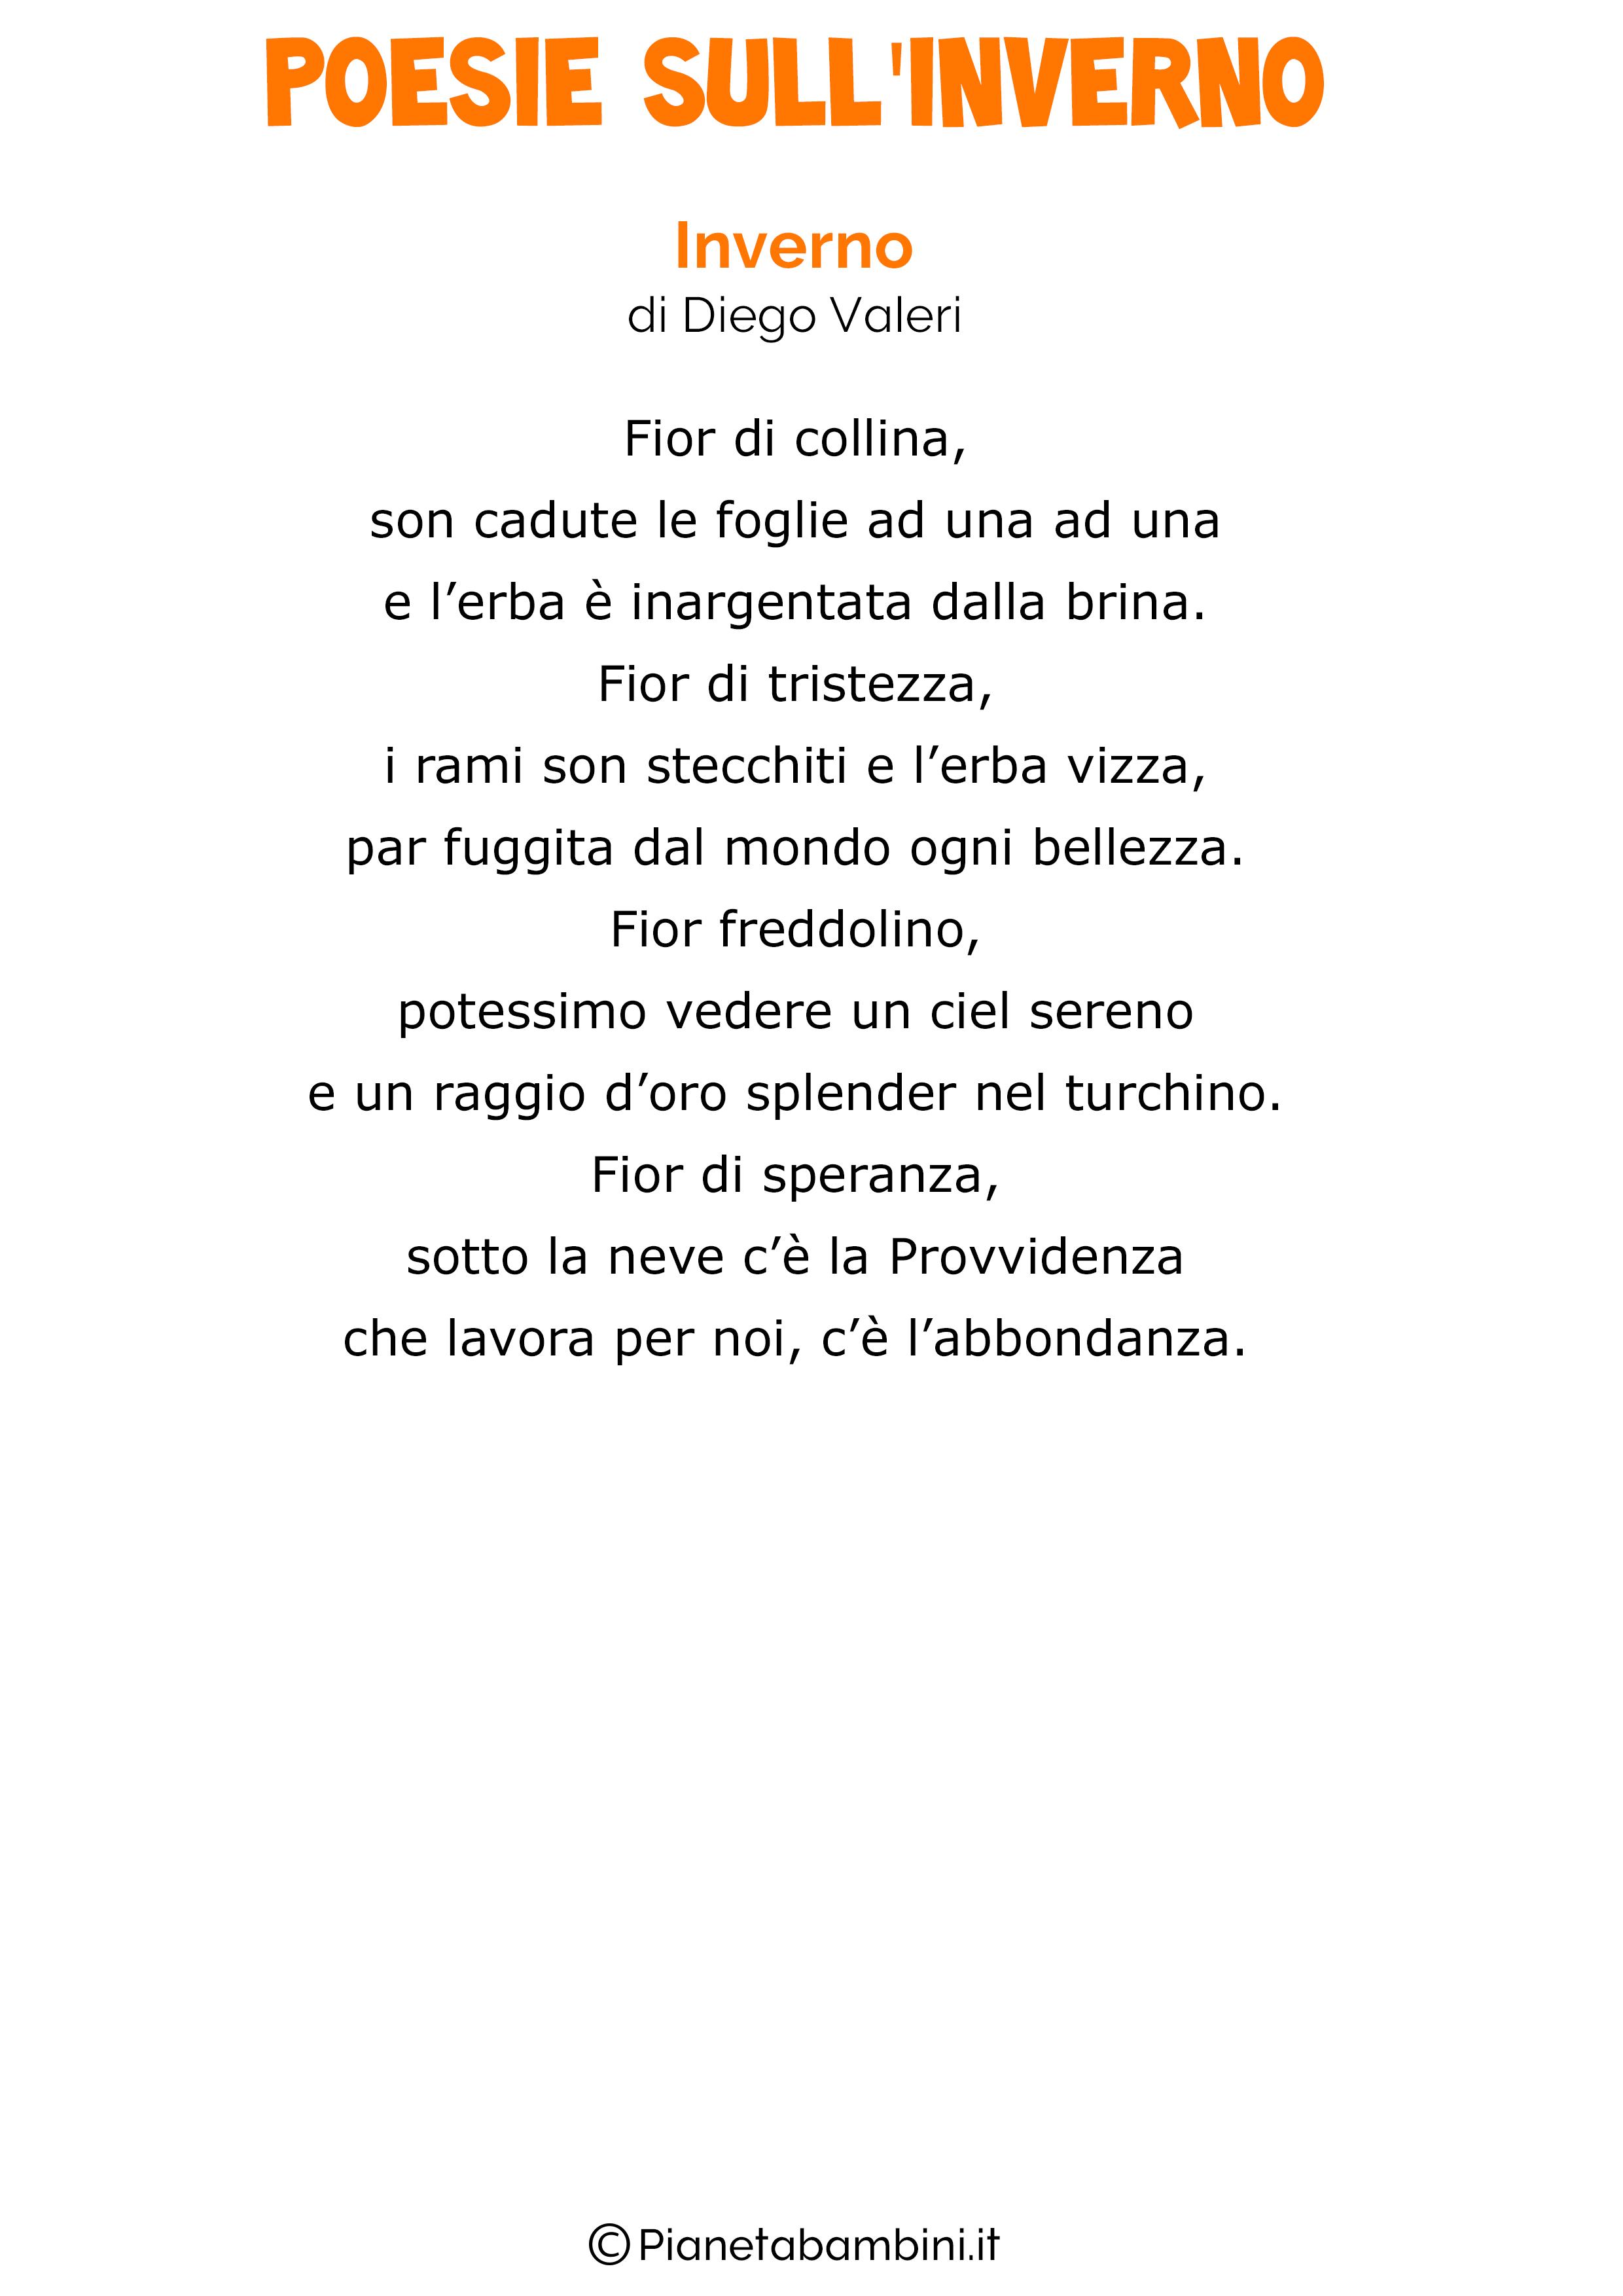 40 Poesie Sullinverno Per Bambini Pianetabambiniit